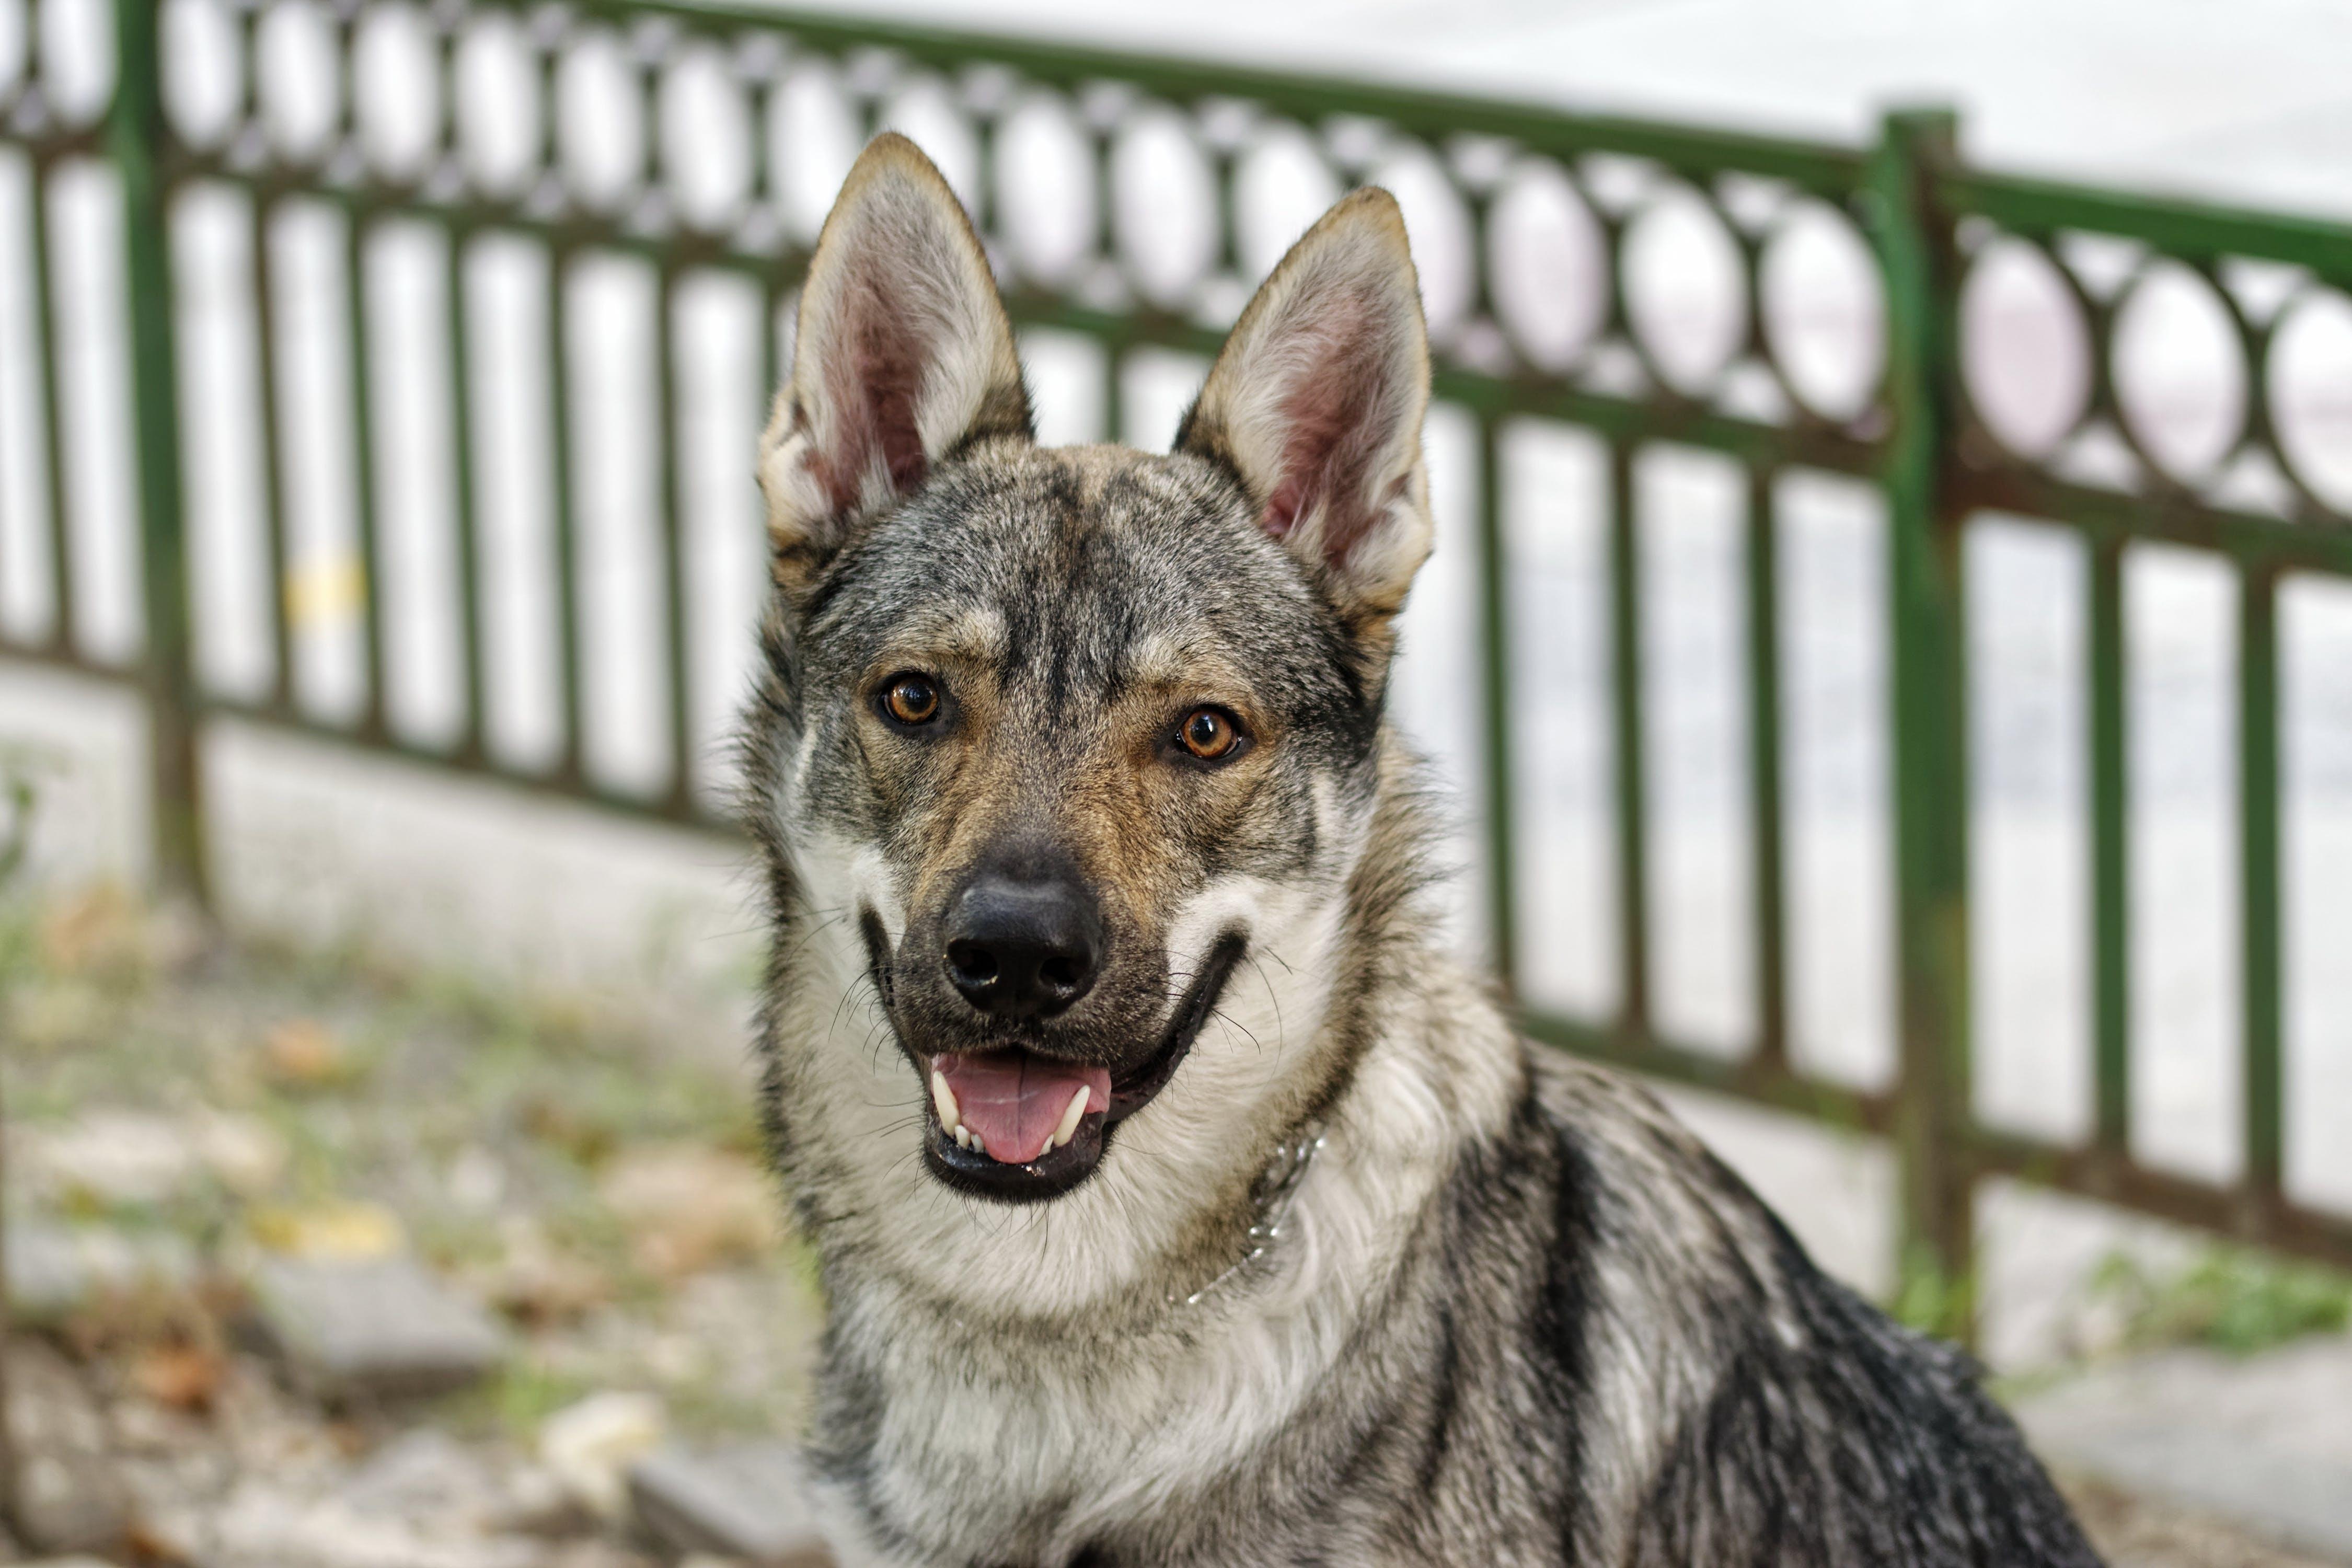 Medium Short-coated Gray Dog on Selective Focus Photo